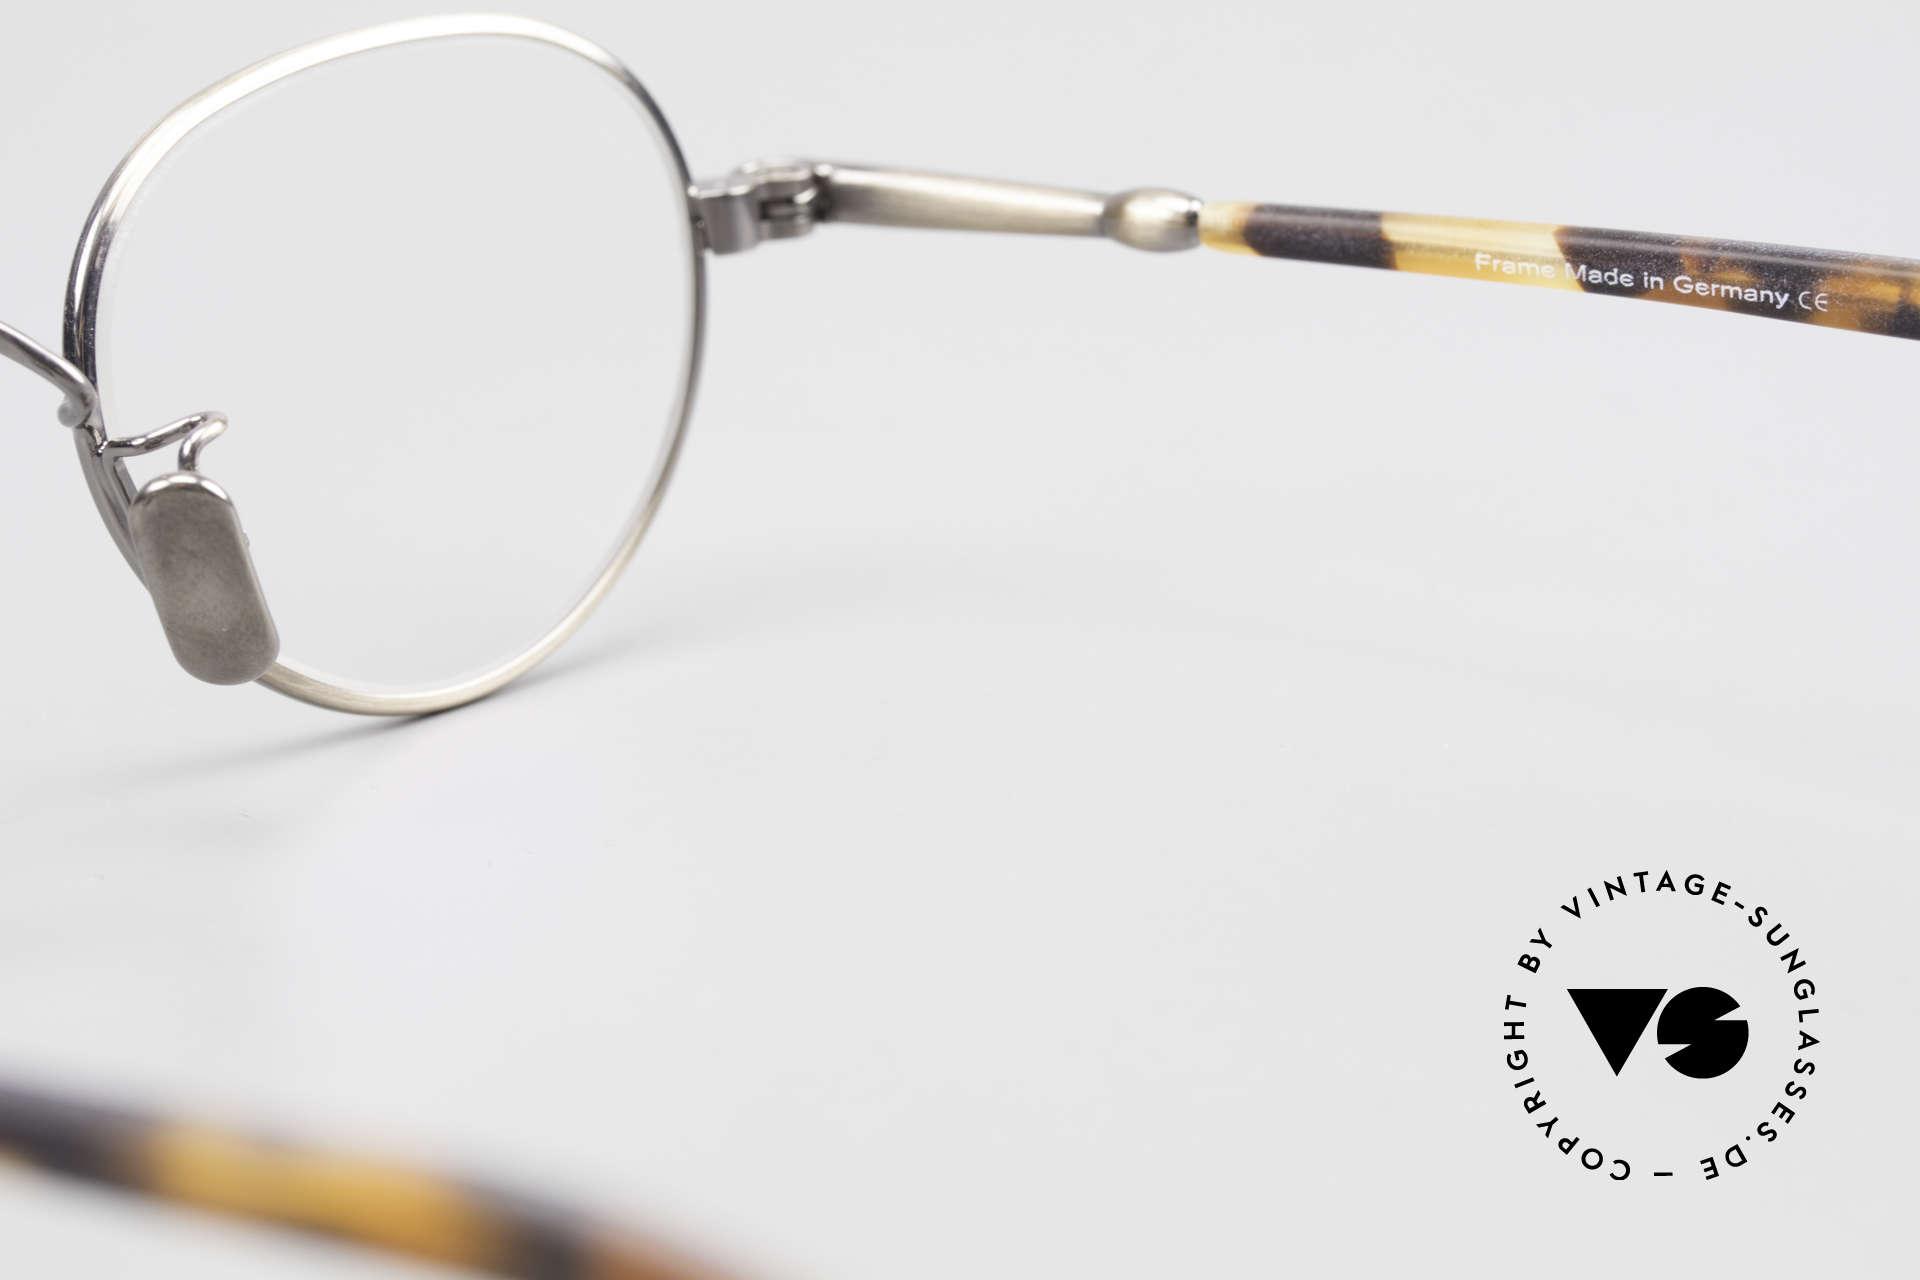 Lunor VA 103 Lunor Eyeglasses Old Original, Size: small, Made for Men and Women